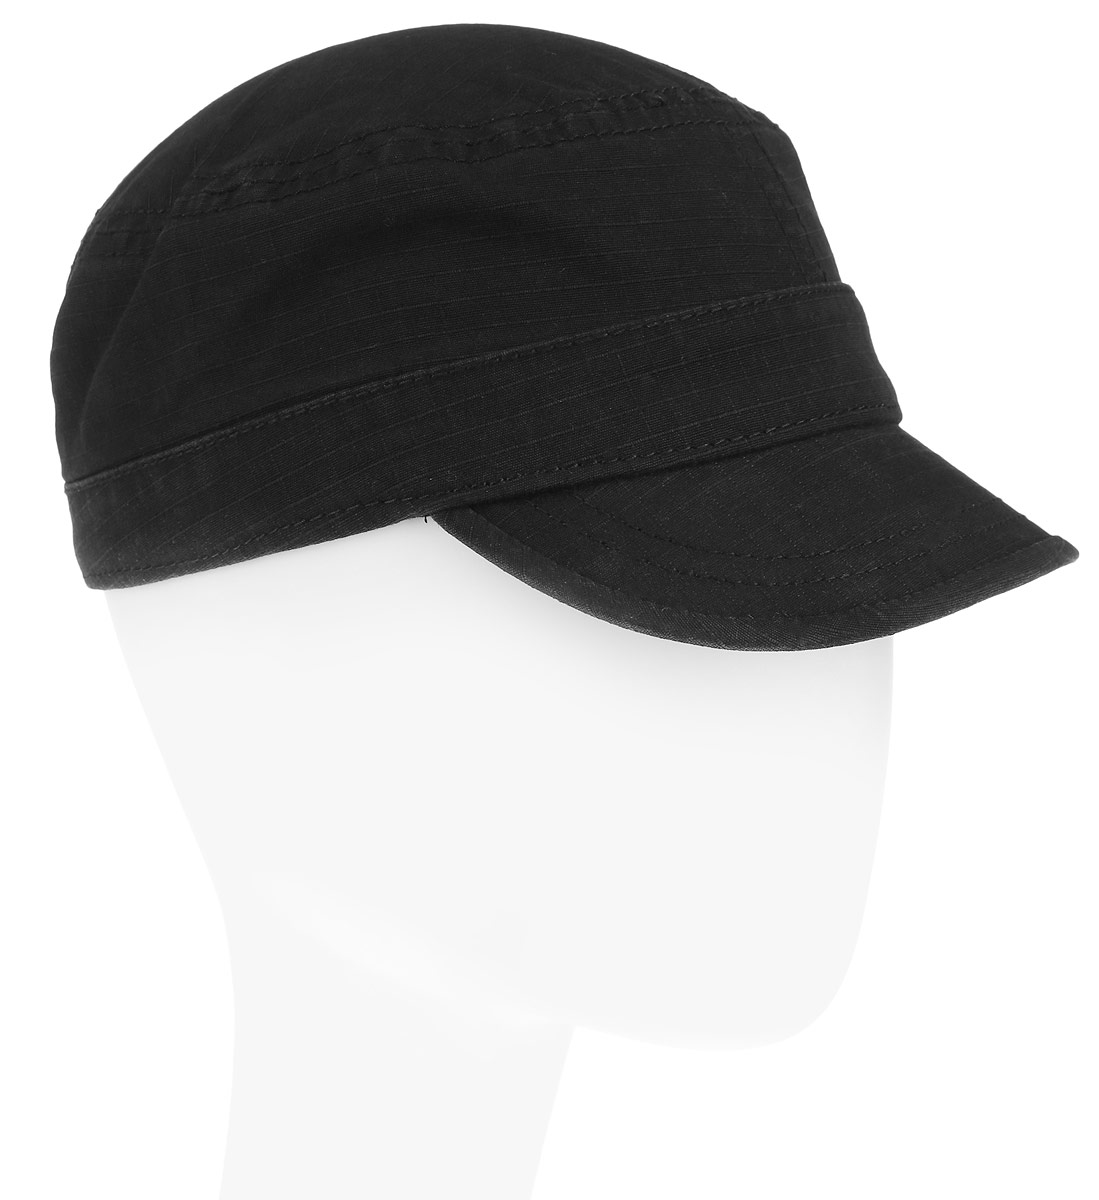 Кепка Goorin Brothers Private, цвет: черный. 42-089-09-57. Размер M (57)